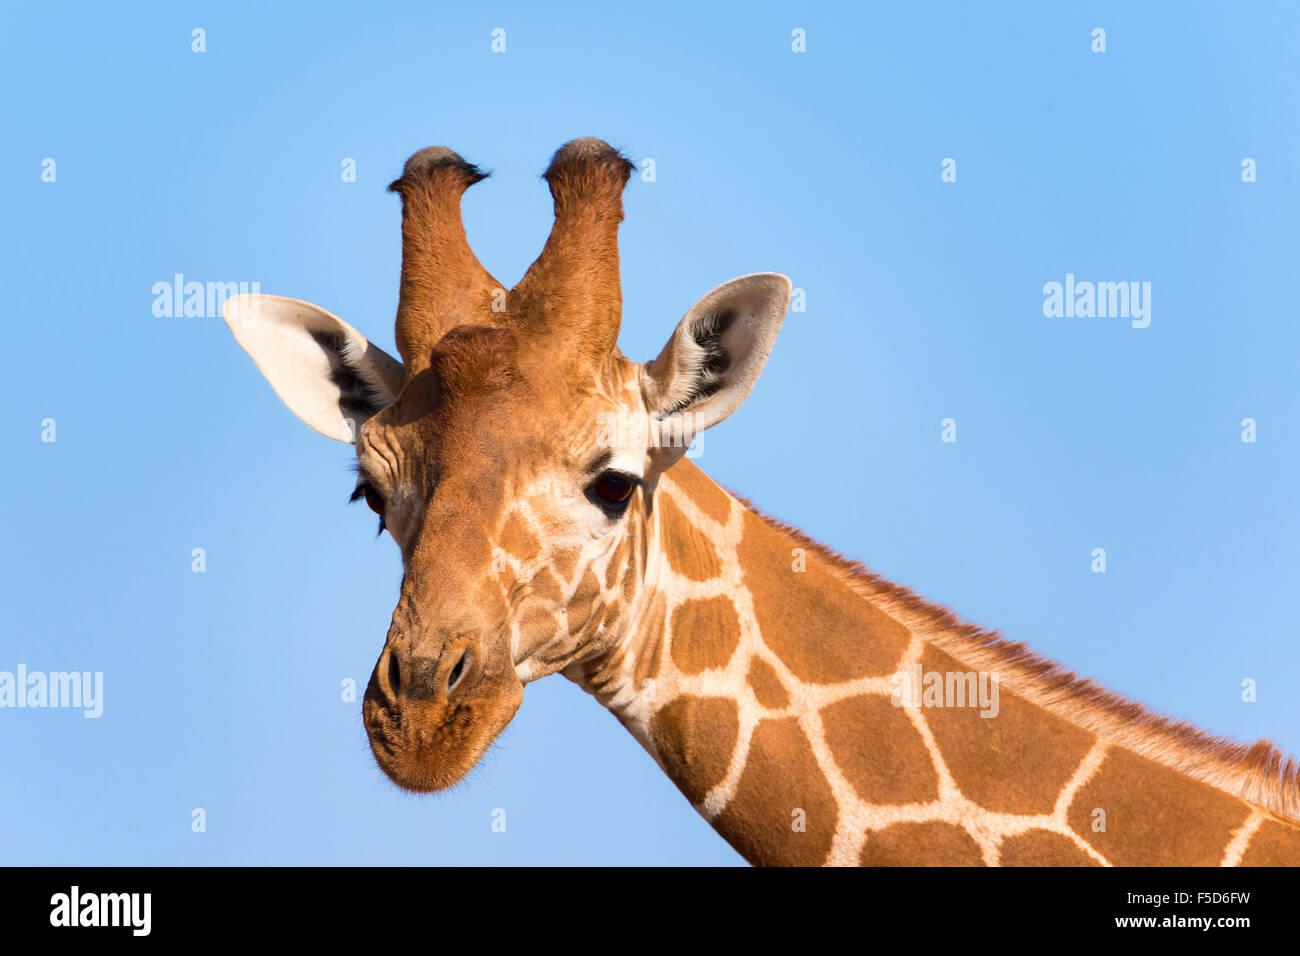 Reticulated giraffe or Somali giraffe (Giraffa reticulata camelopardalis), portrait, Samburu National Reserve, Kenya Stock Photo